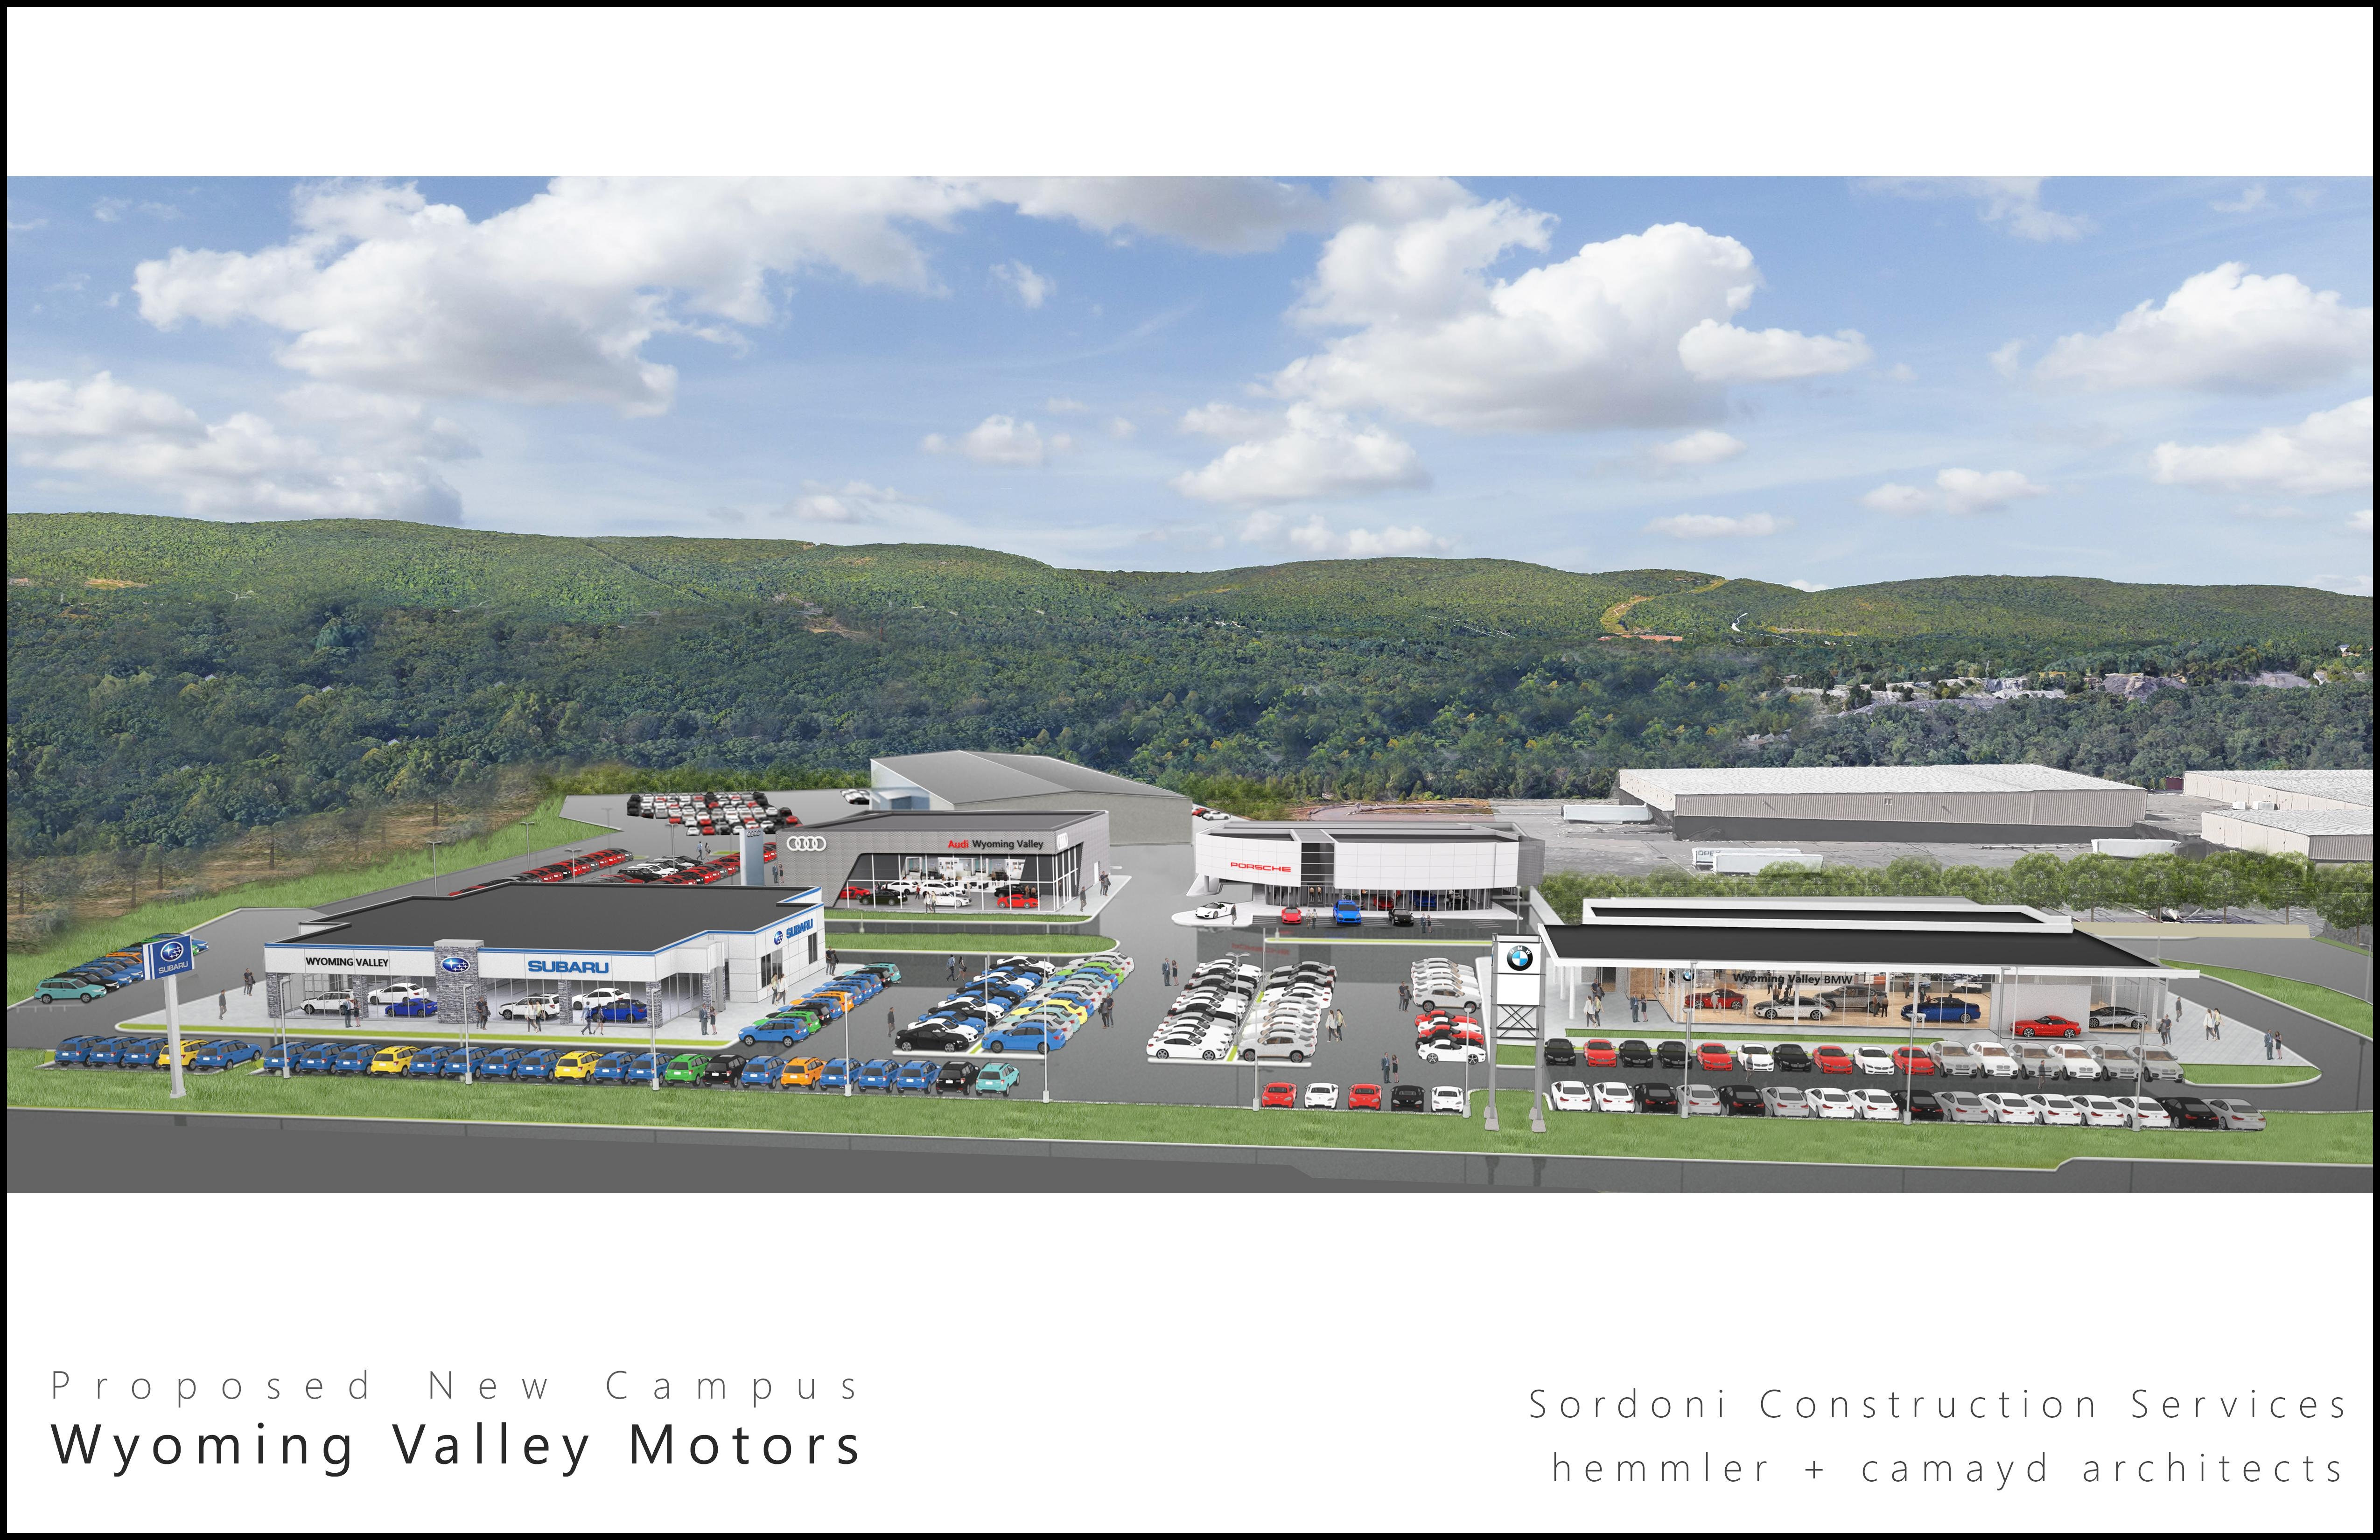 Wyoming Valley Motors Makes its Move